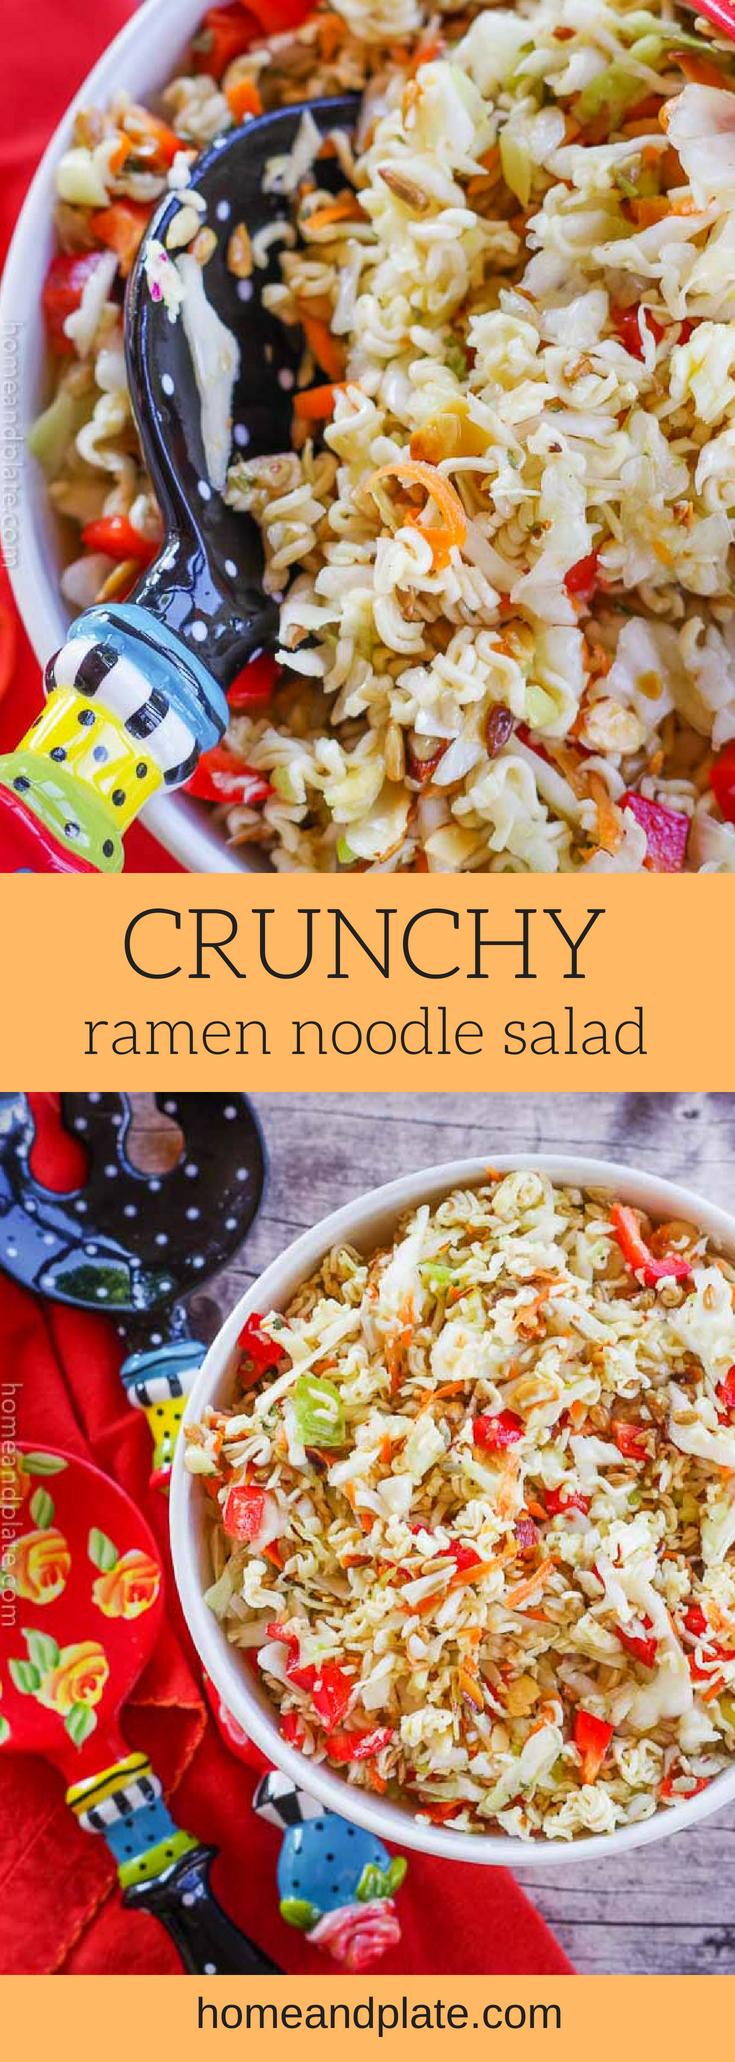 Crunchy Ramen Noodle Salad | www.homeandplate.com | This crunchy Ramen noodle salad is the perfect side dish for any barbecue or summer dinner. #ramennoodlesalad #orientalcoleslaw #coleslaw #chinesecoleslaw